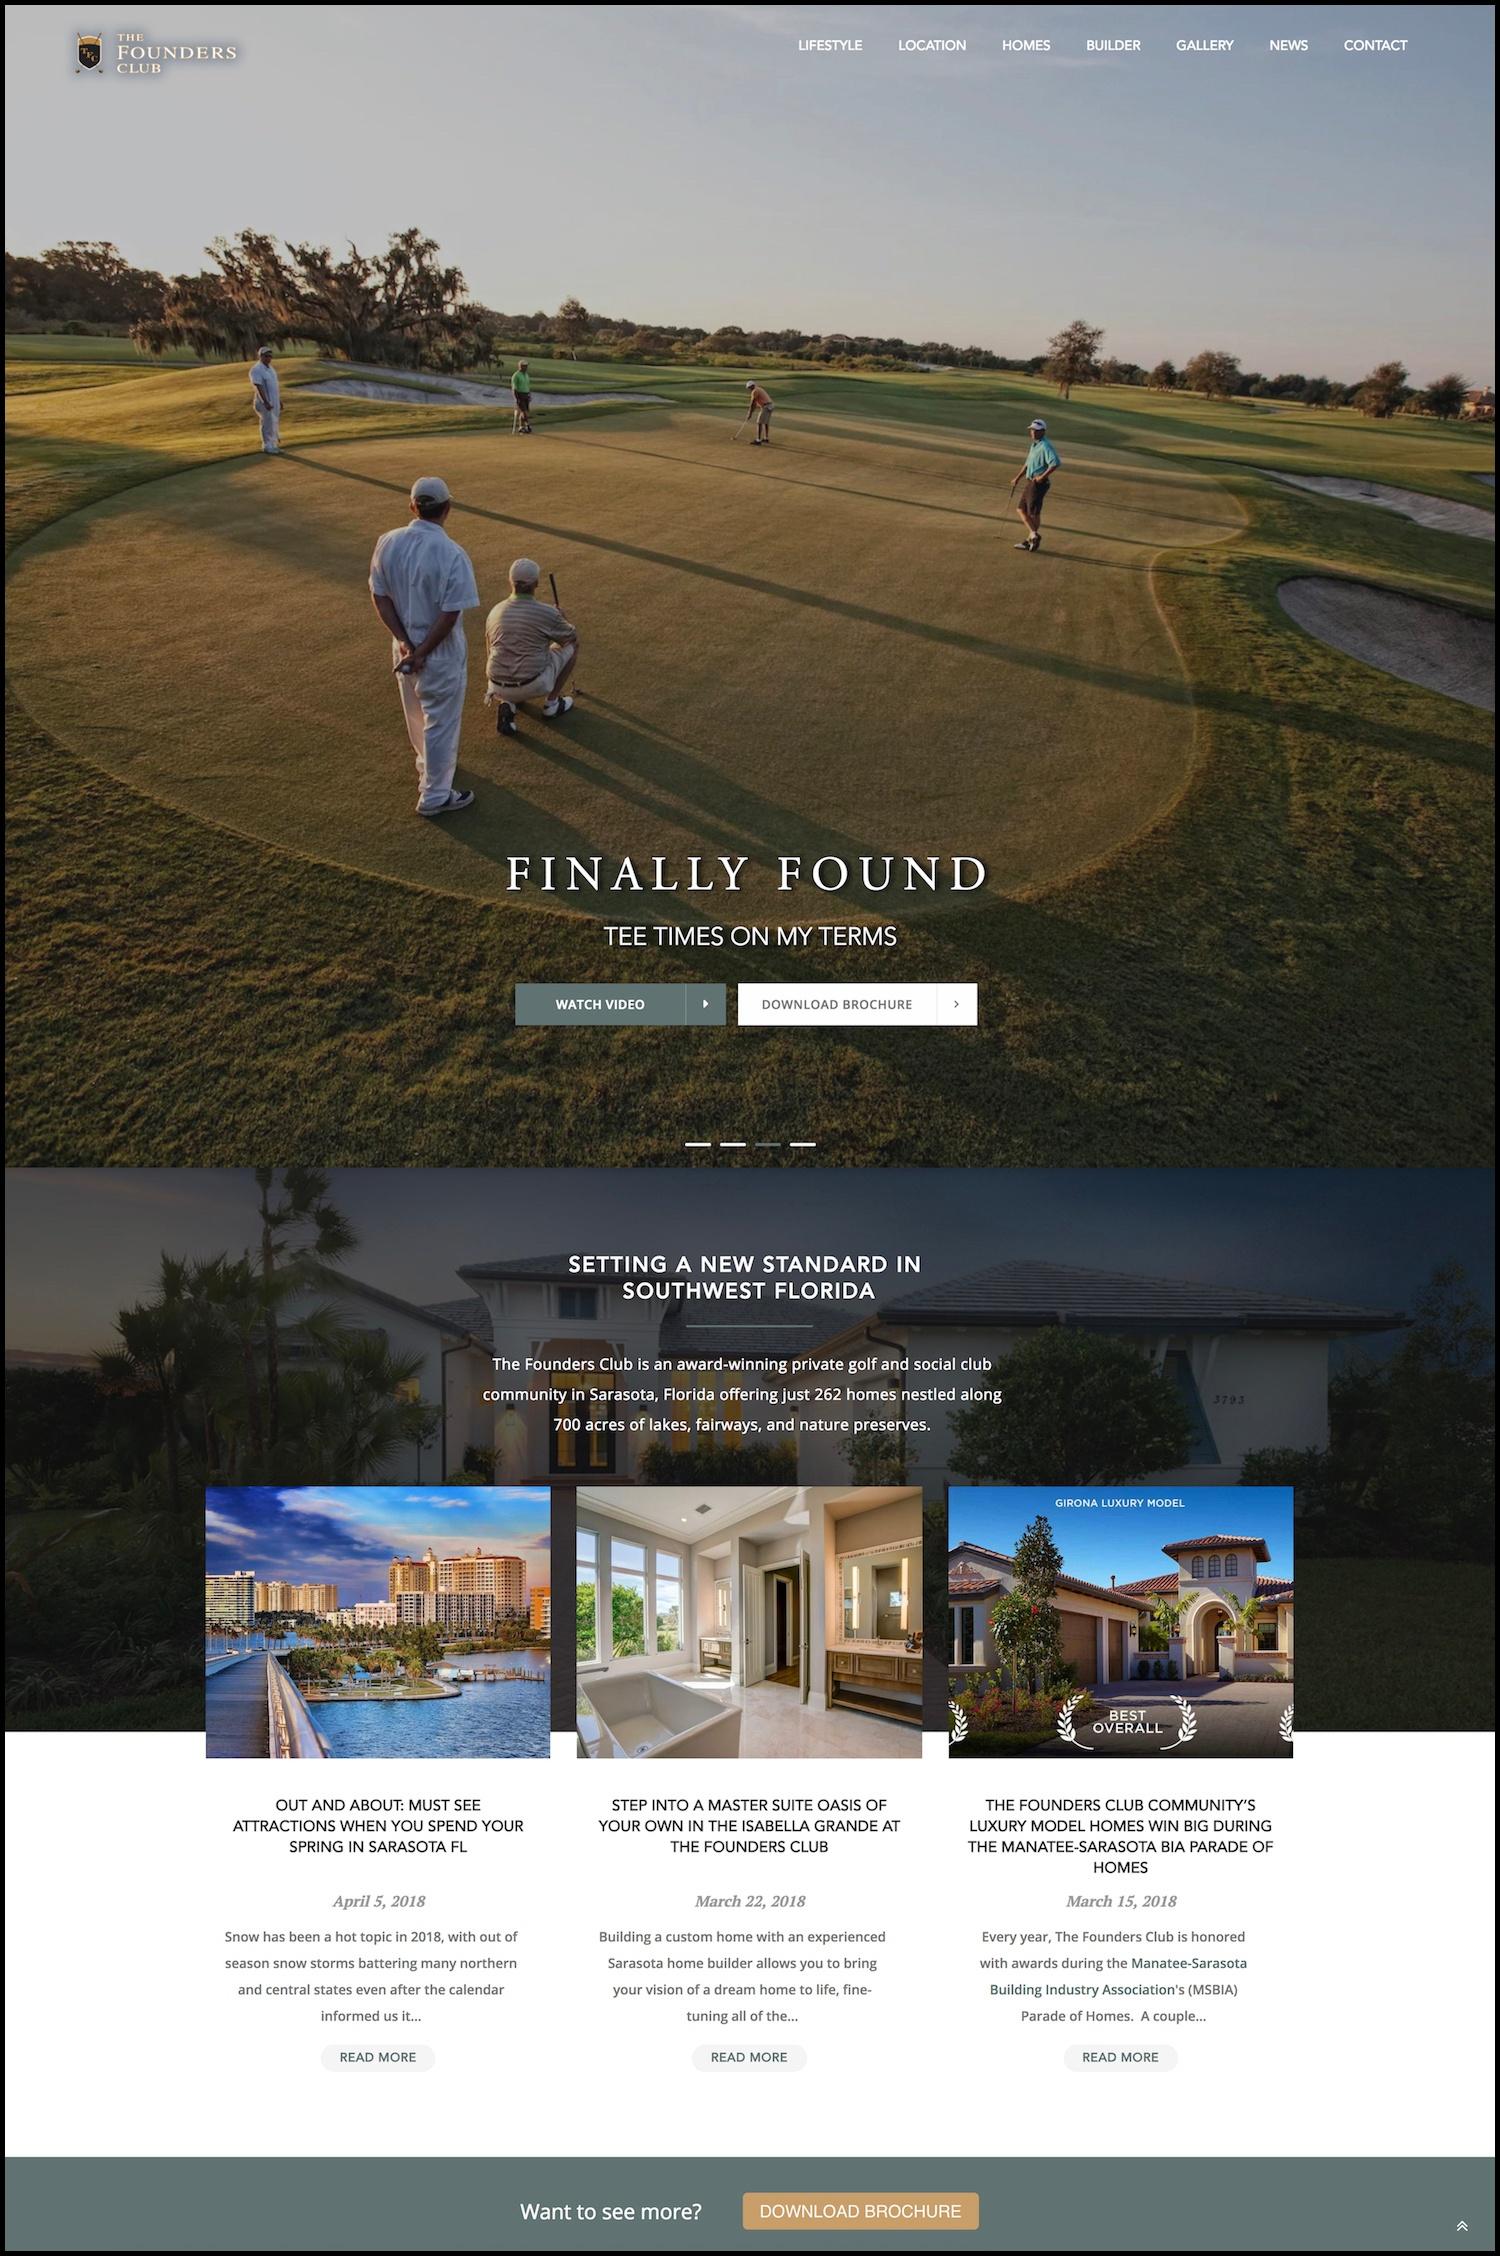 The Founders Club Sarasota Florida